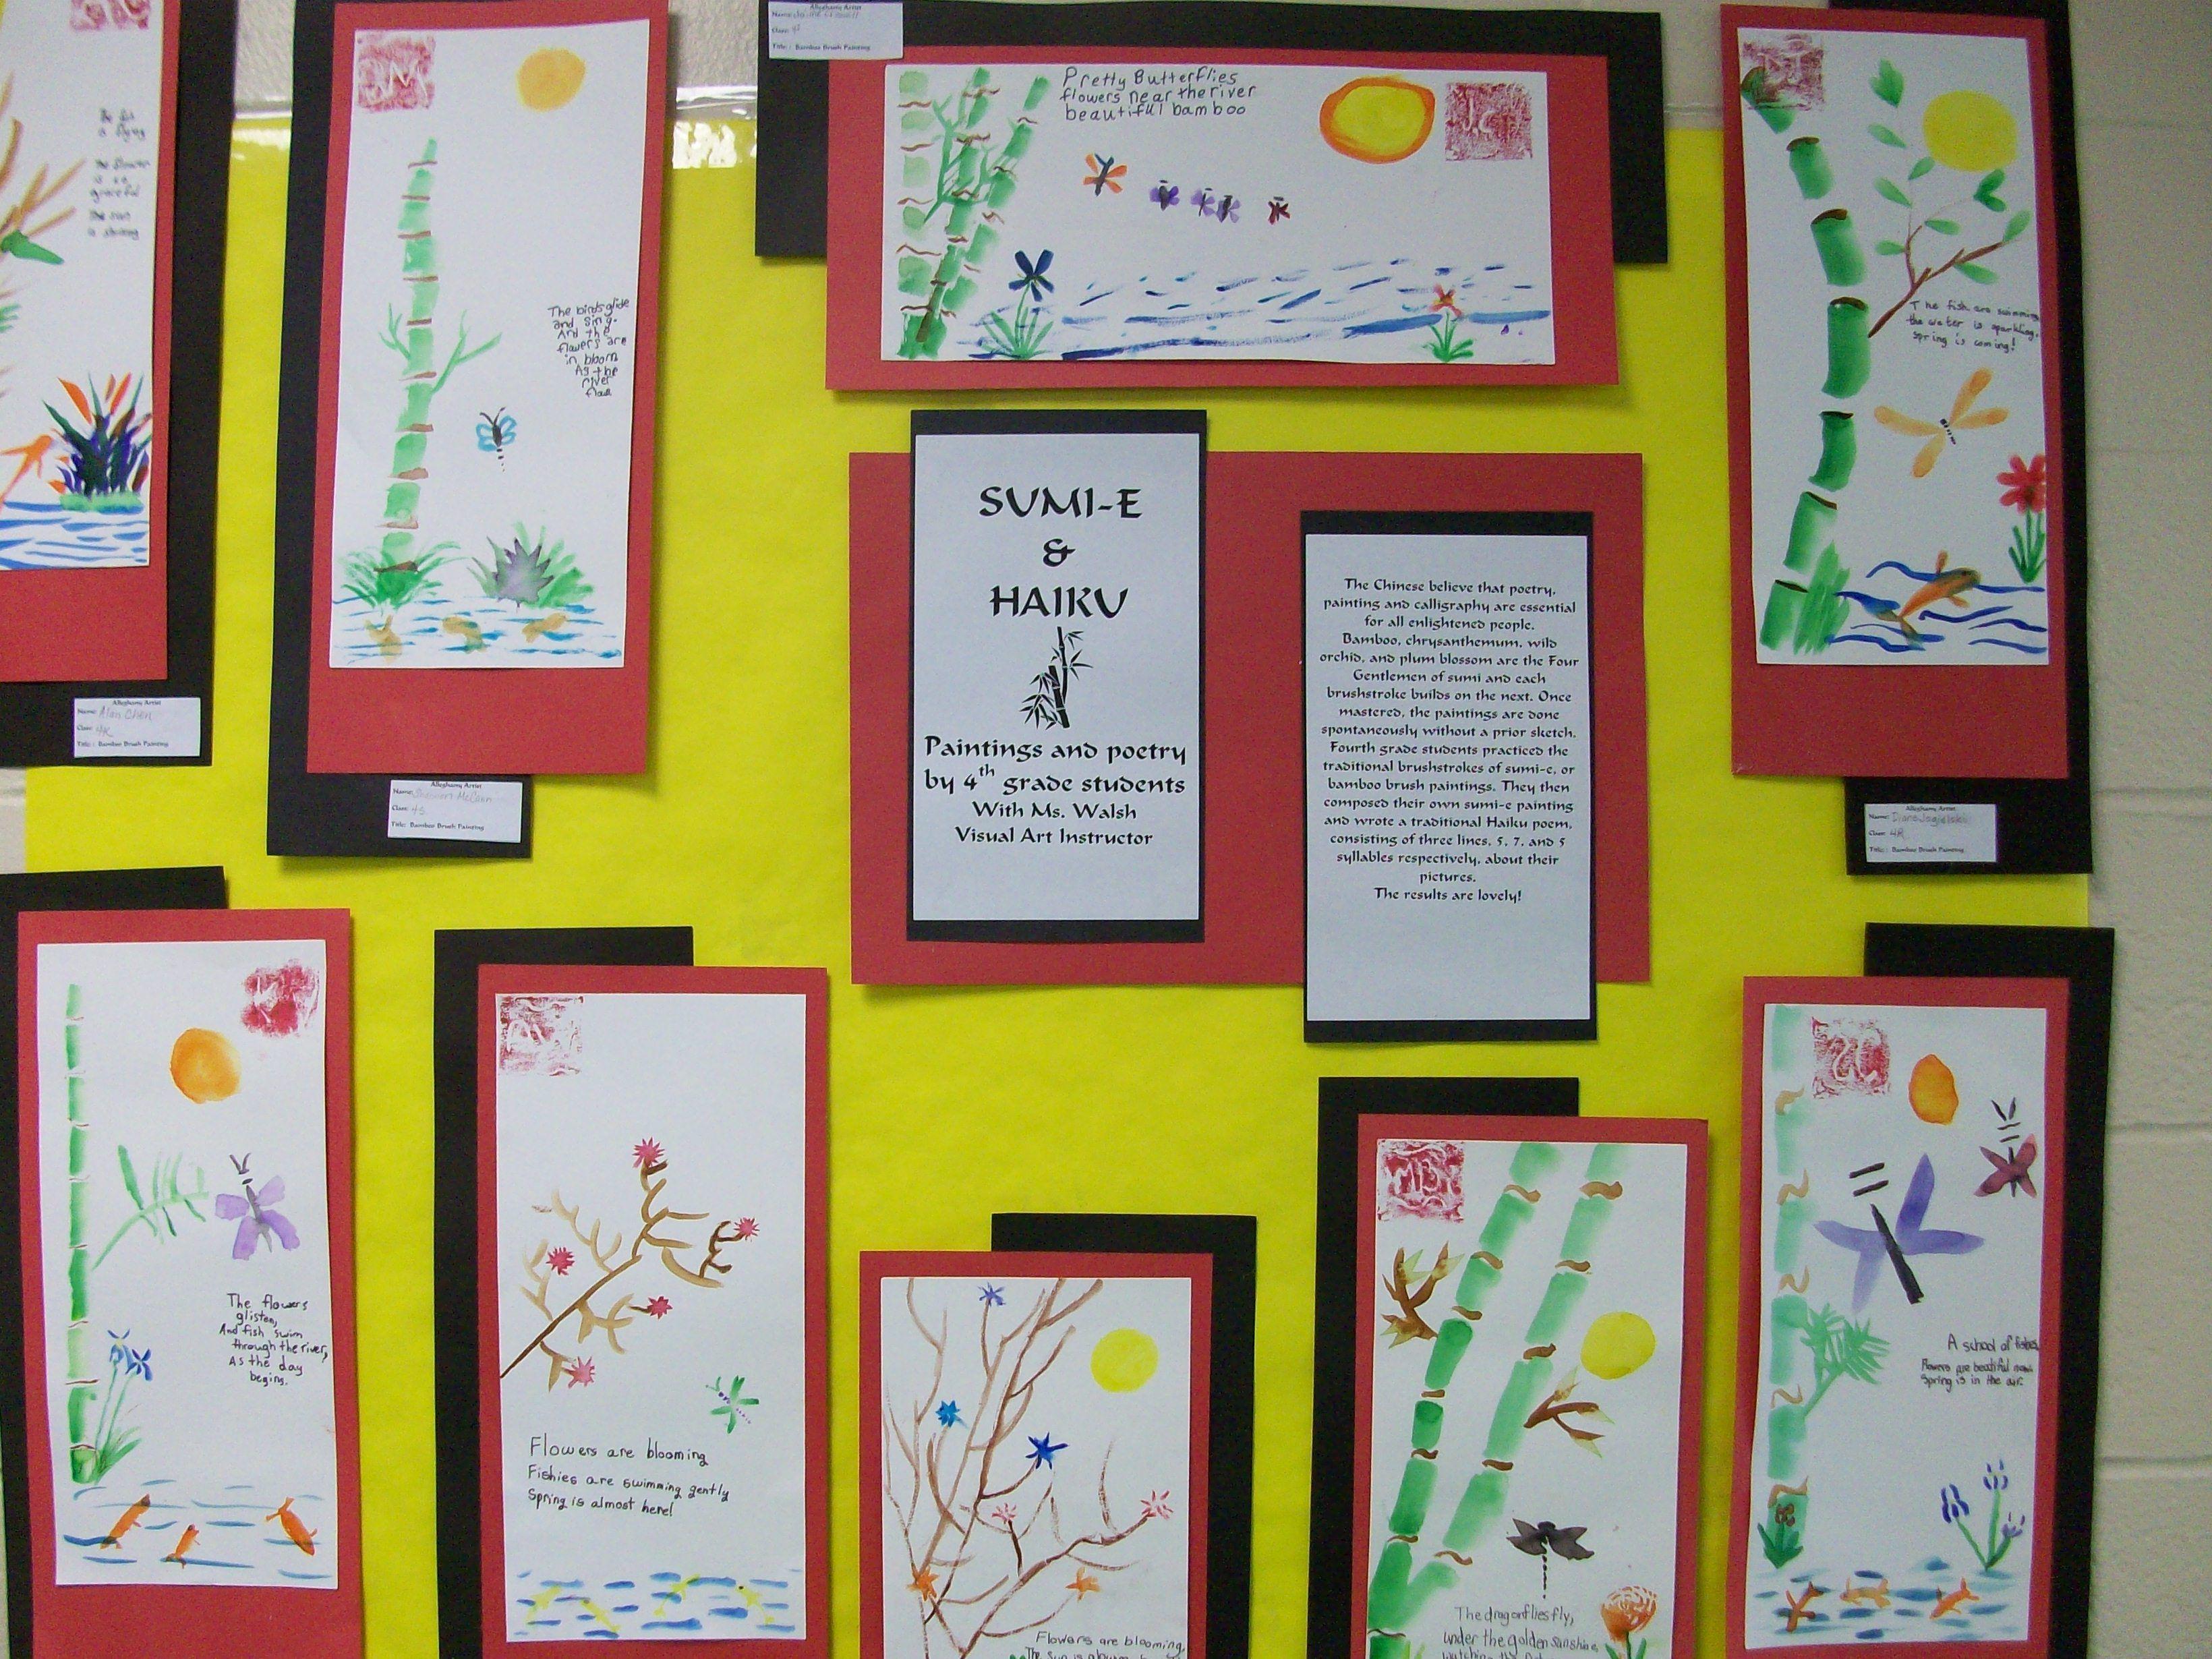 Sumi E Mboo Brush Painting And Haiku With 4th Grade